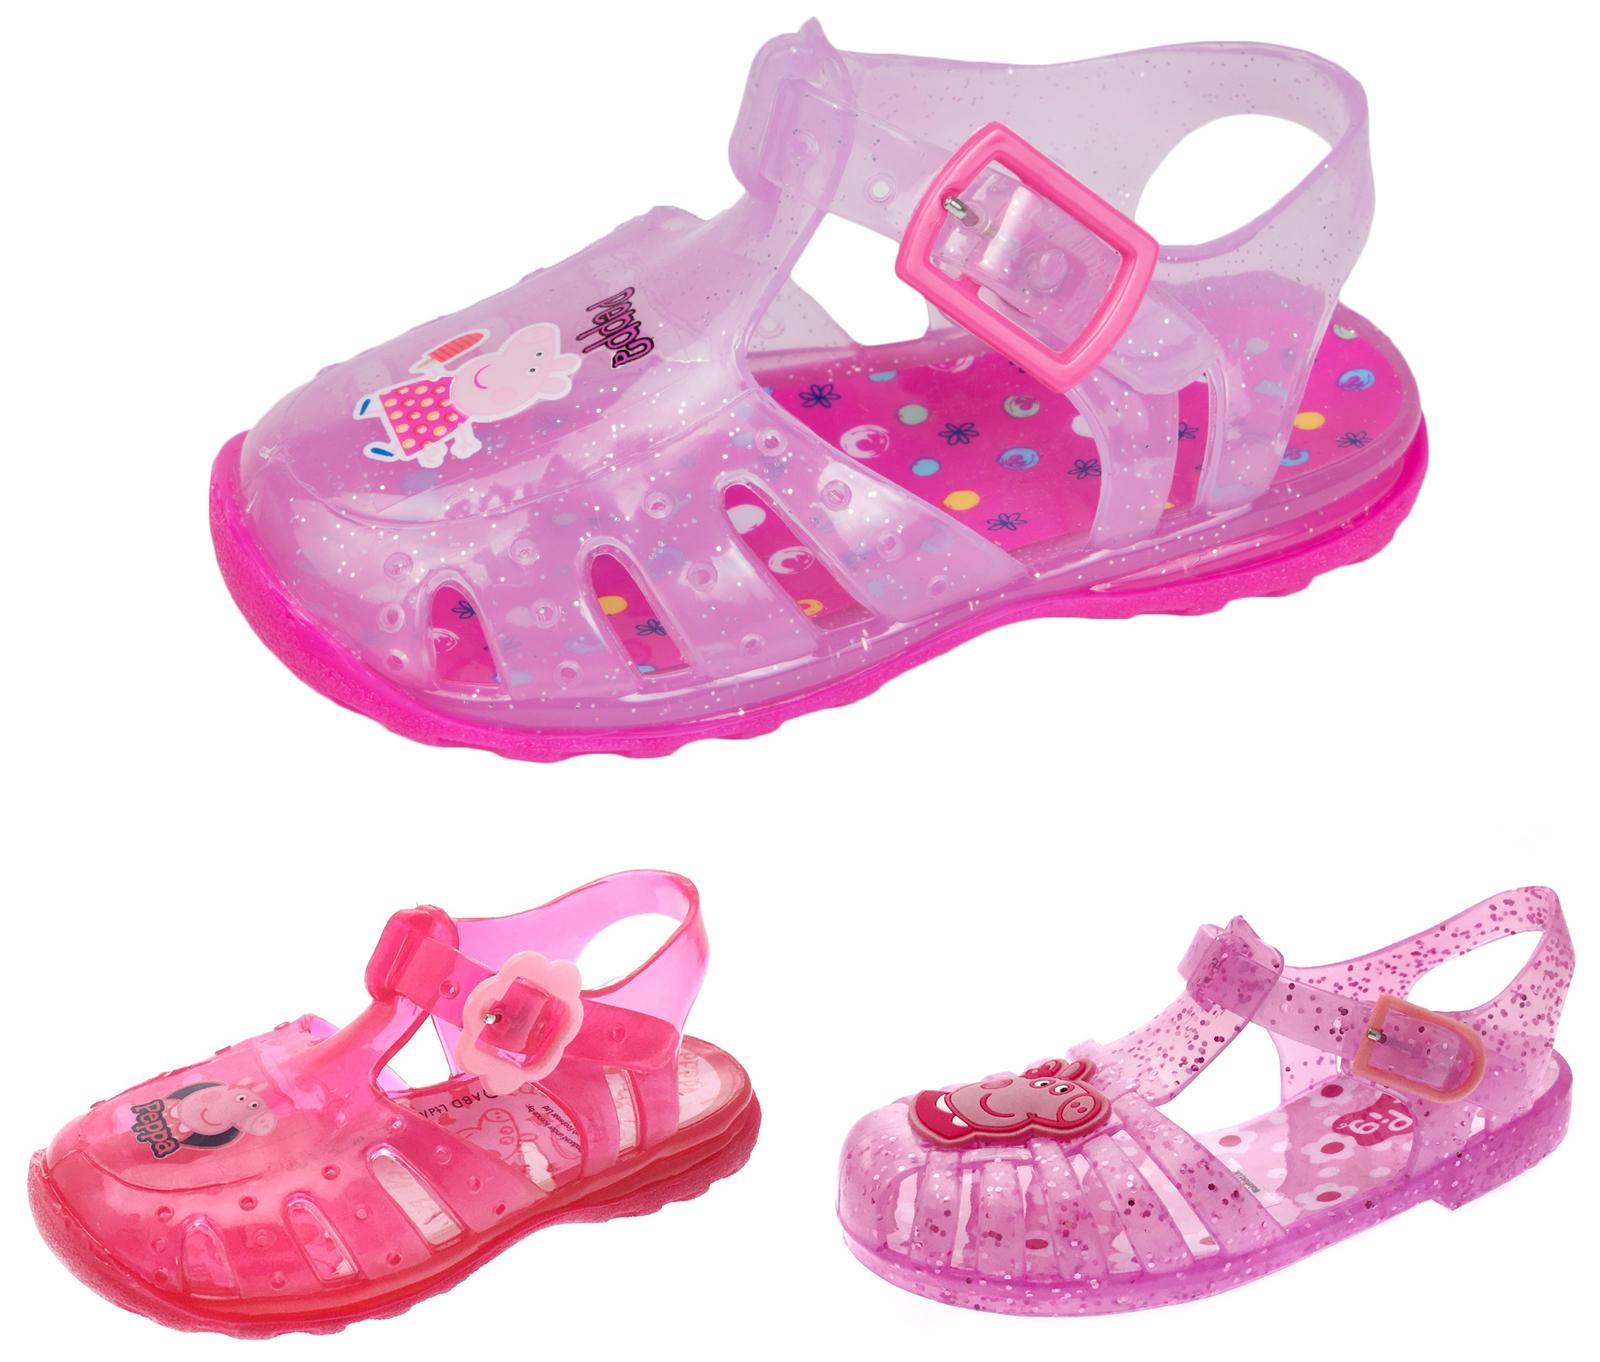 Girls Flip Flops Summer Sandals Shoes Pool Beach Childrens Holiday